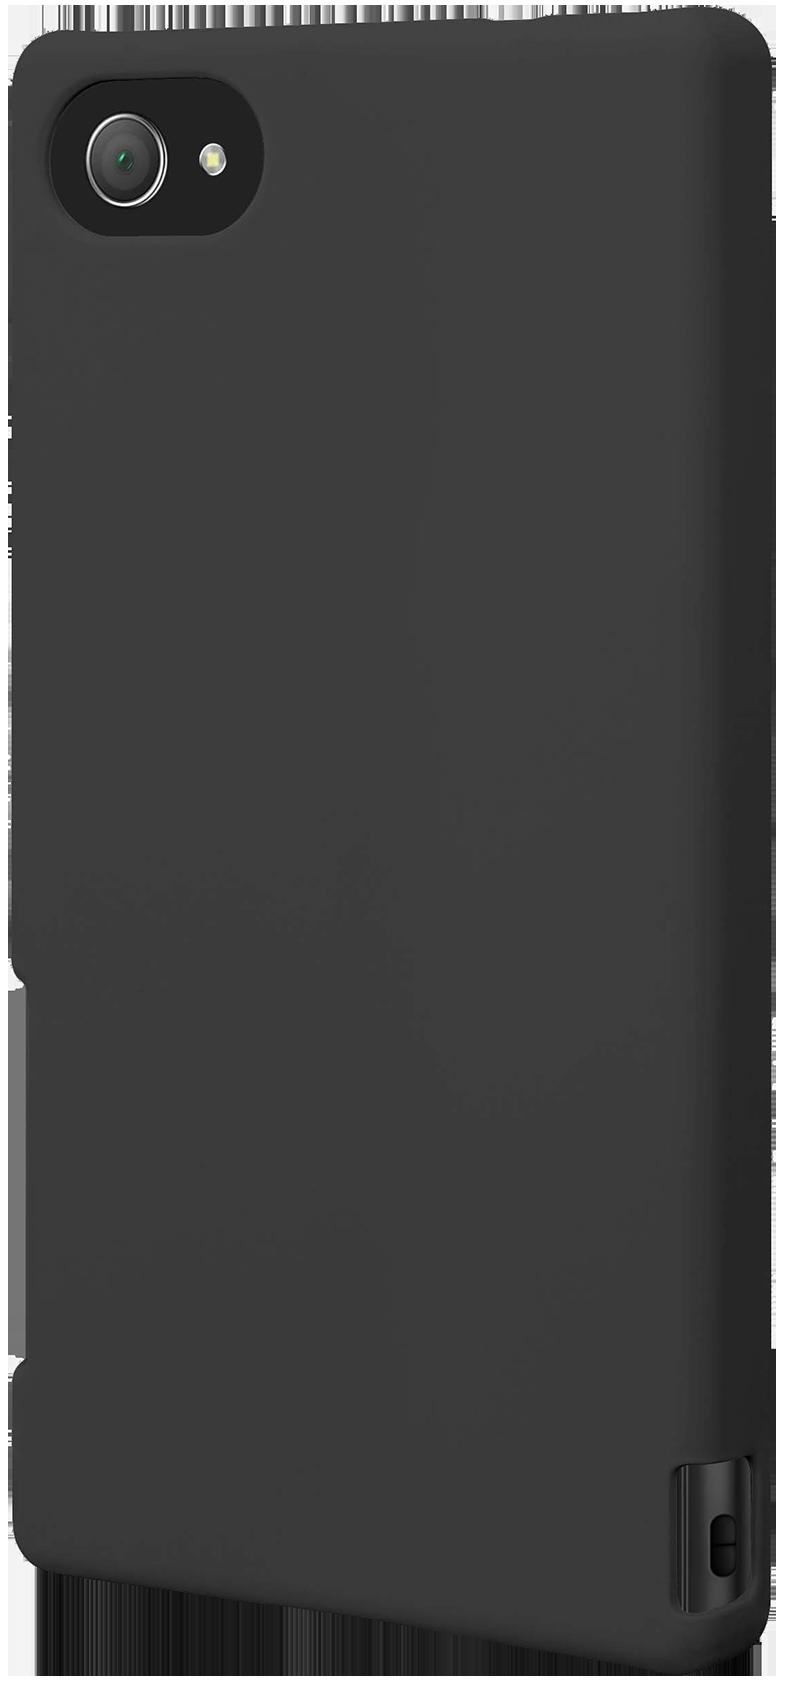 Coque Made for Xperia Z5 Compact noir